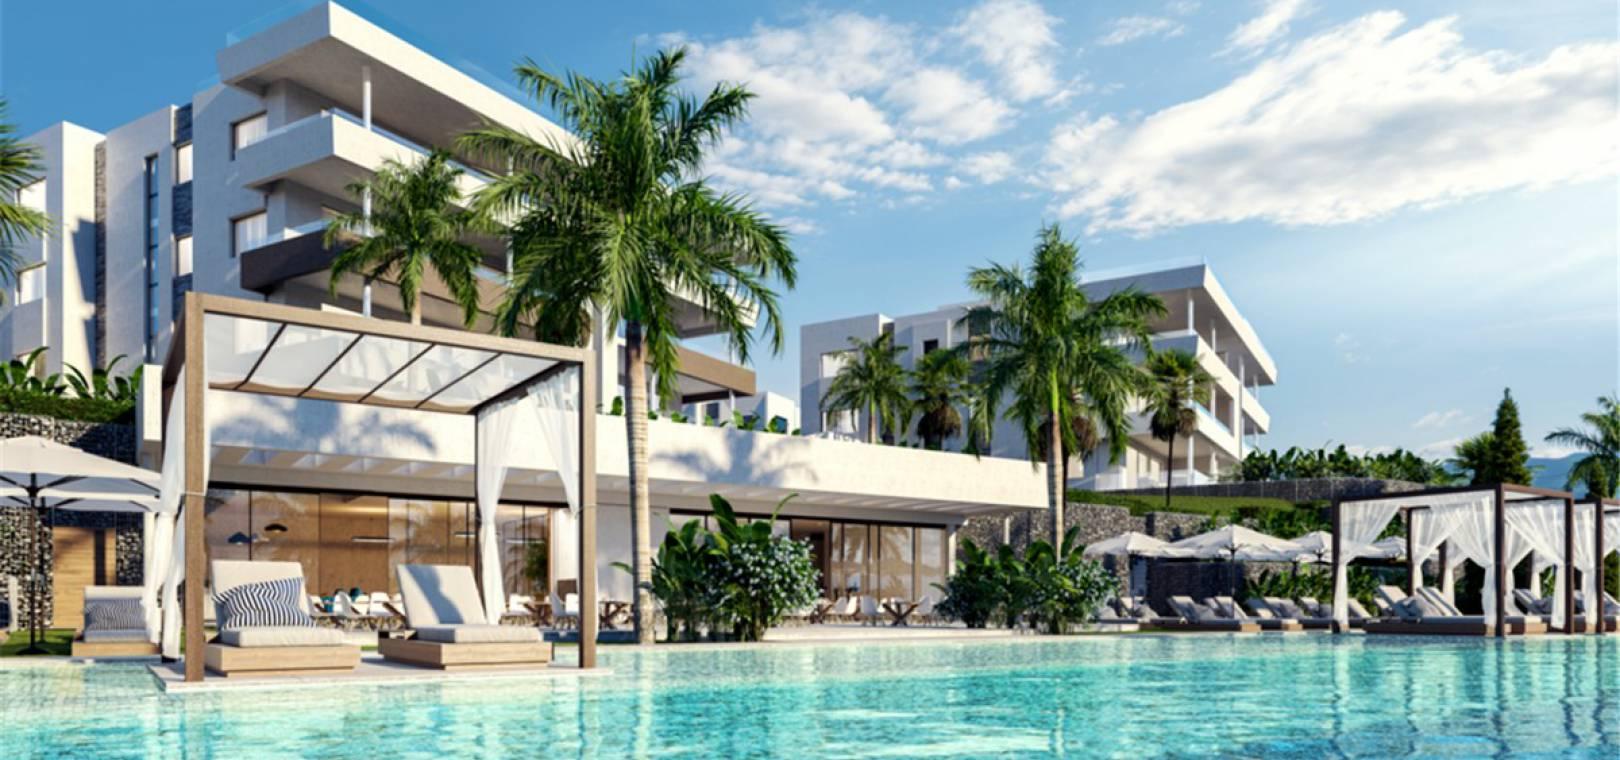 New Build - Villa - Marbella